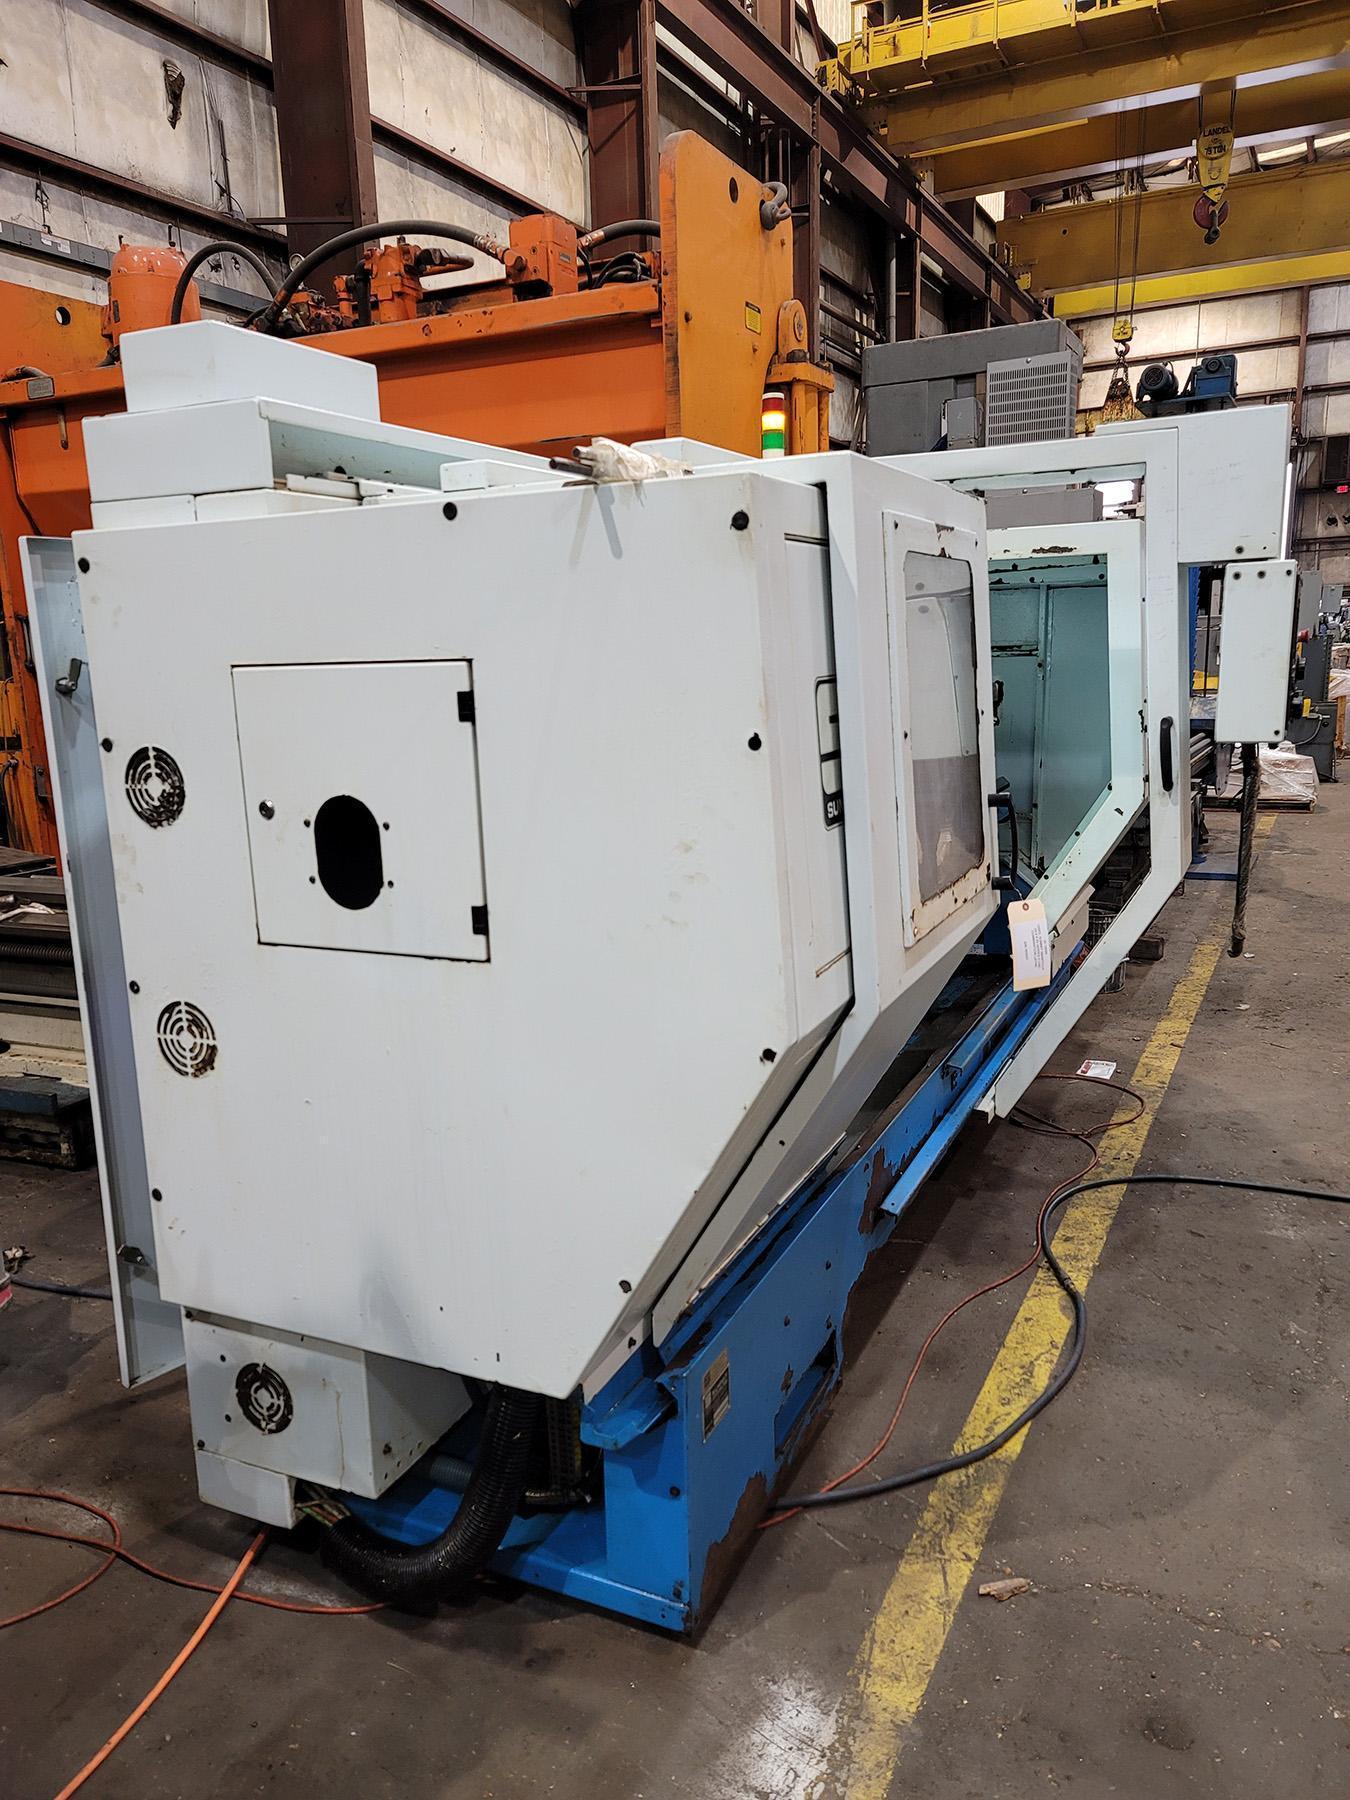 USED, SUMMIT SMARTCUT 24-4 X 80 SERIES II CNC COMBINATION LATHE